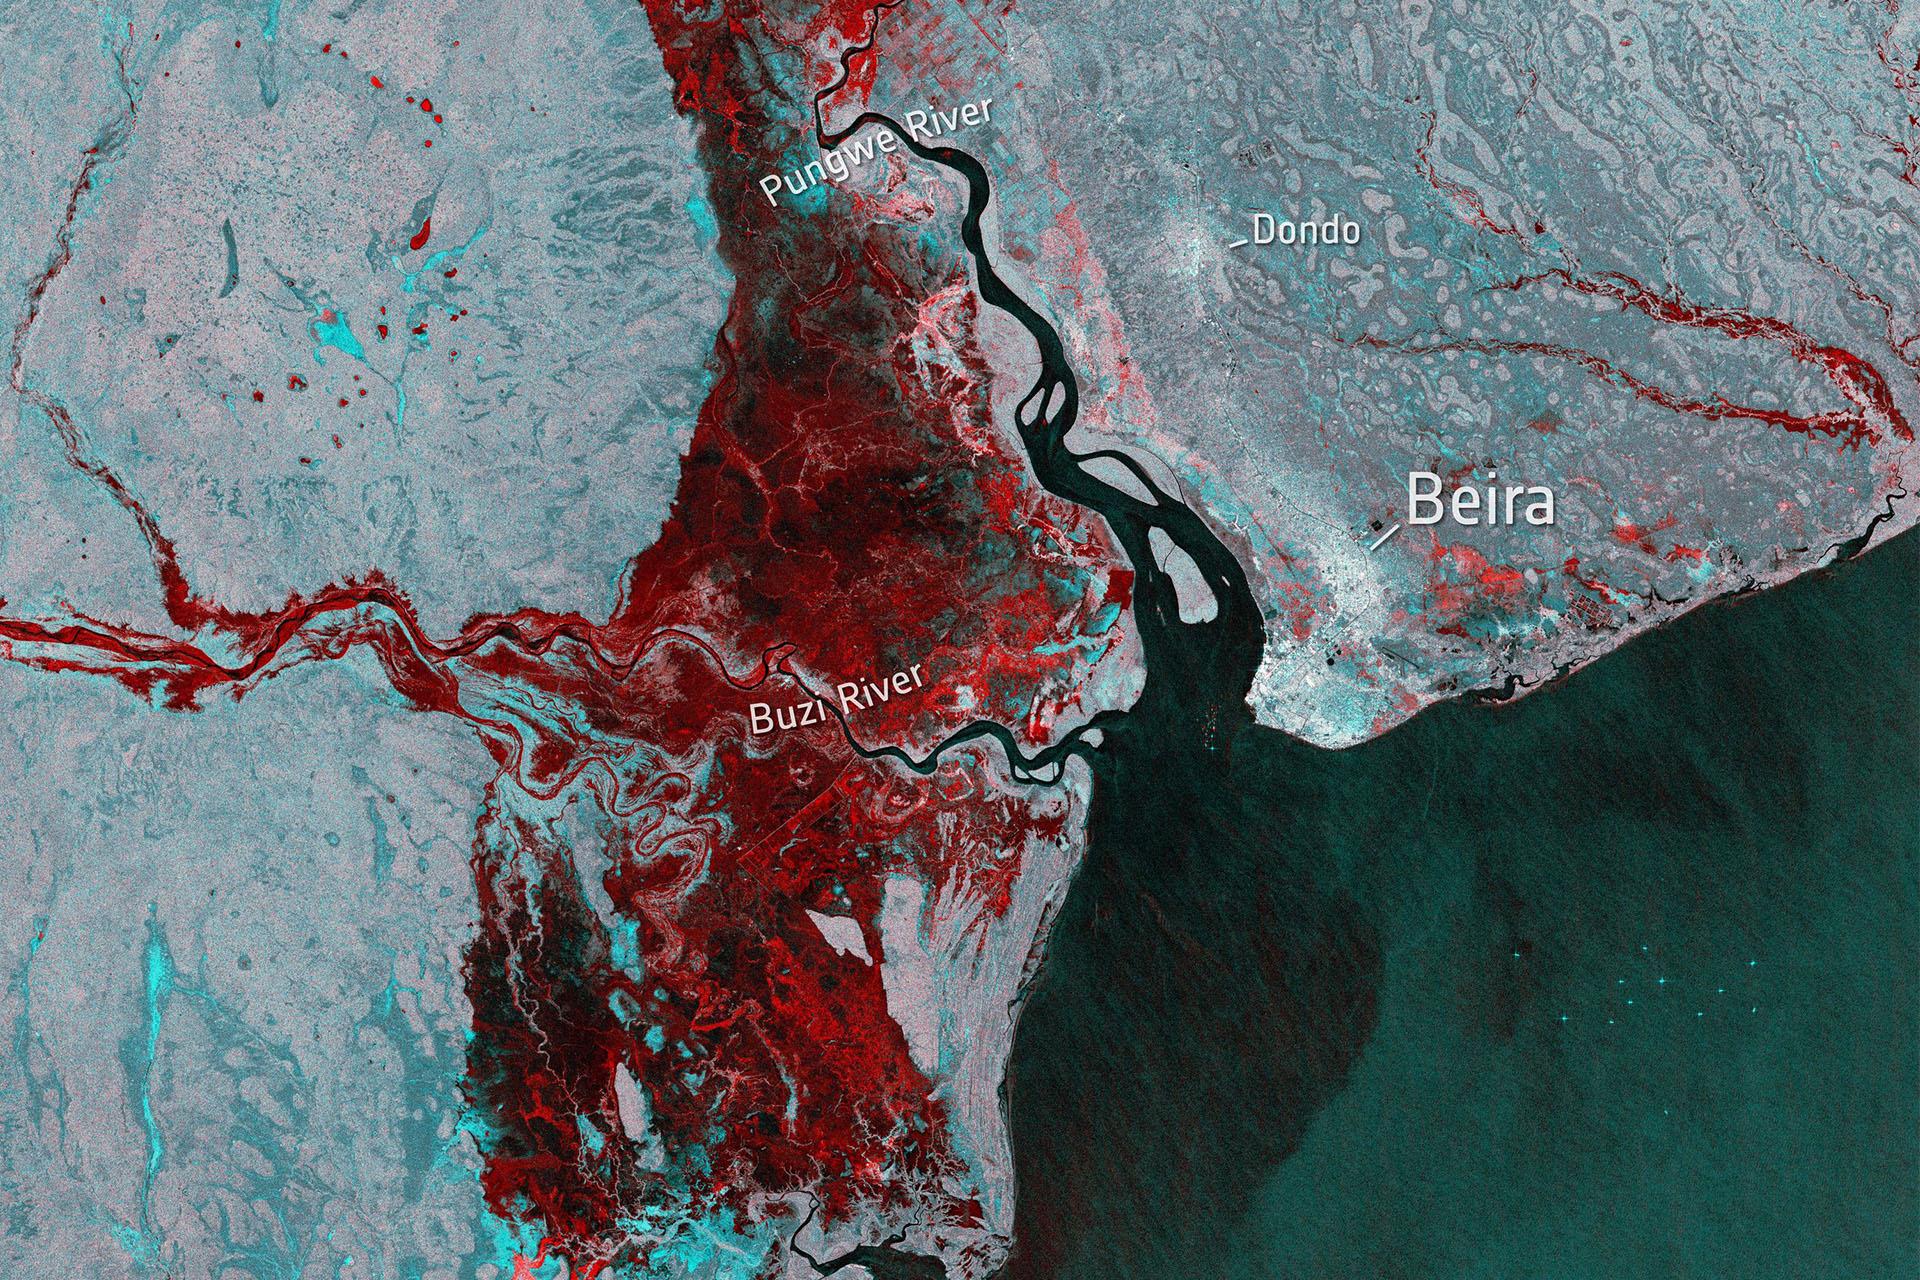 Cyclone Idai – The Mozambique Floods 2019